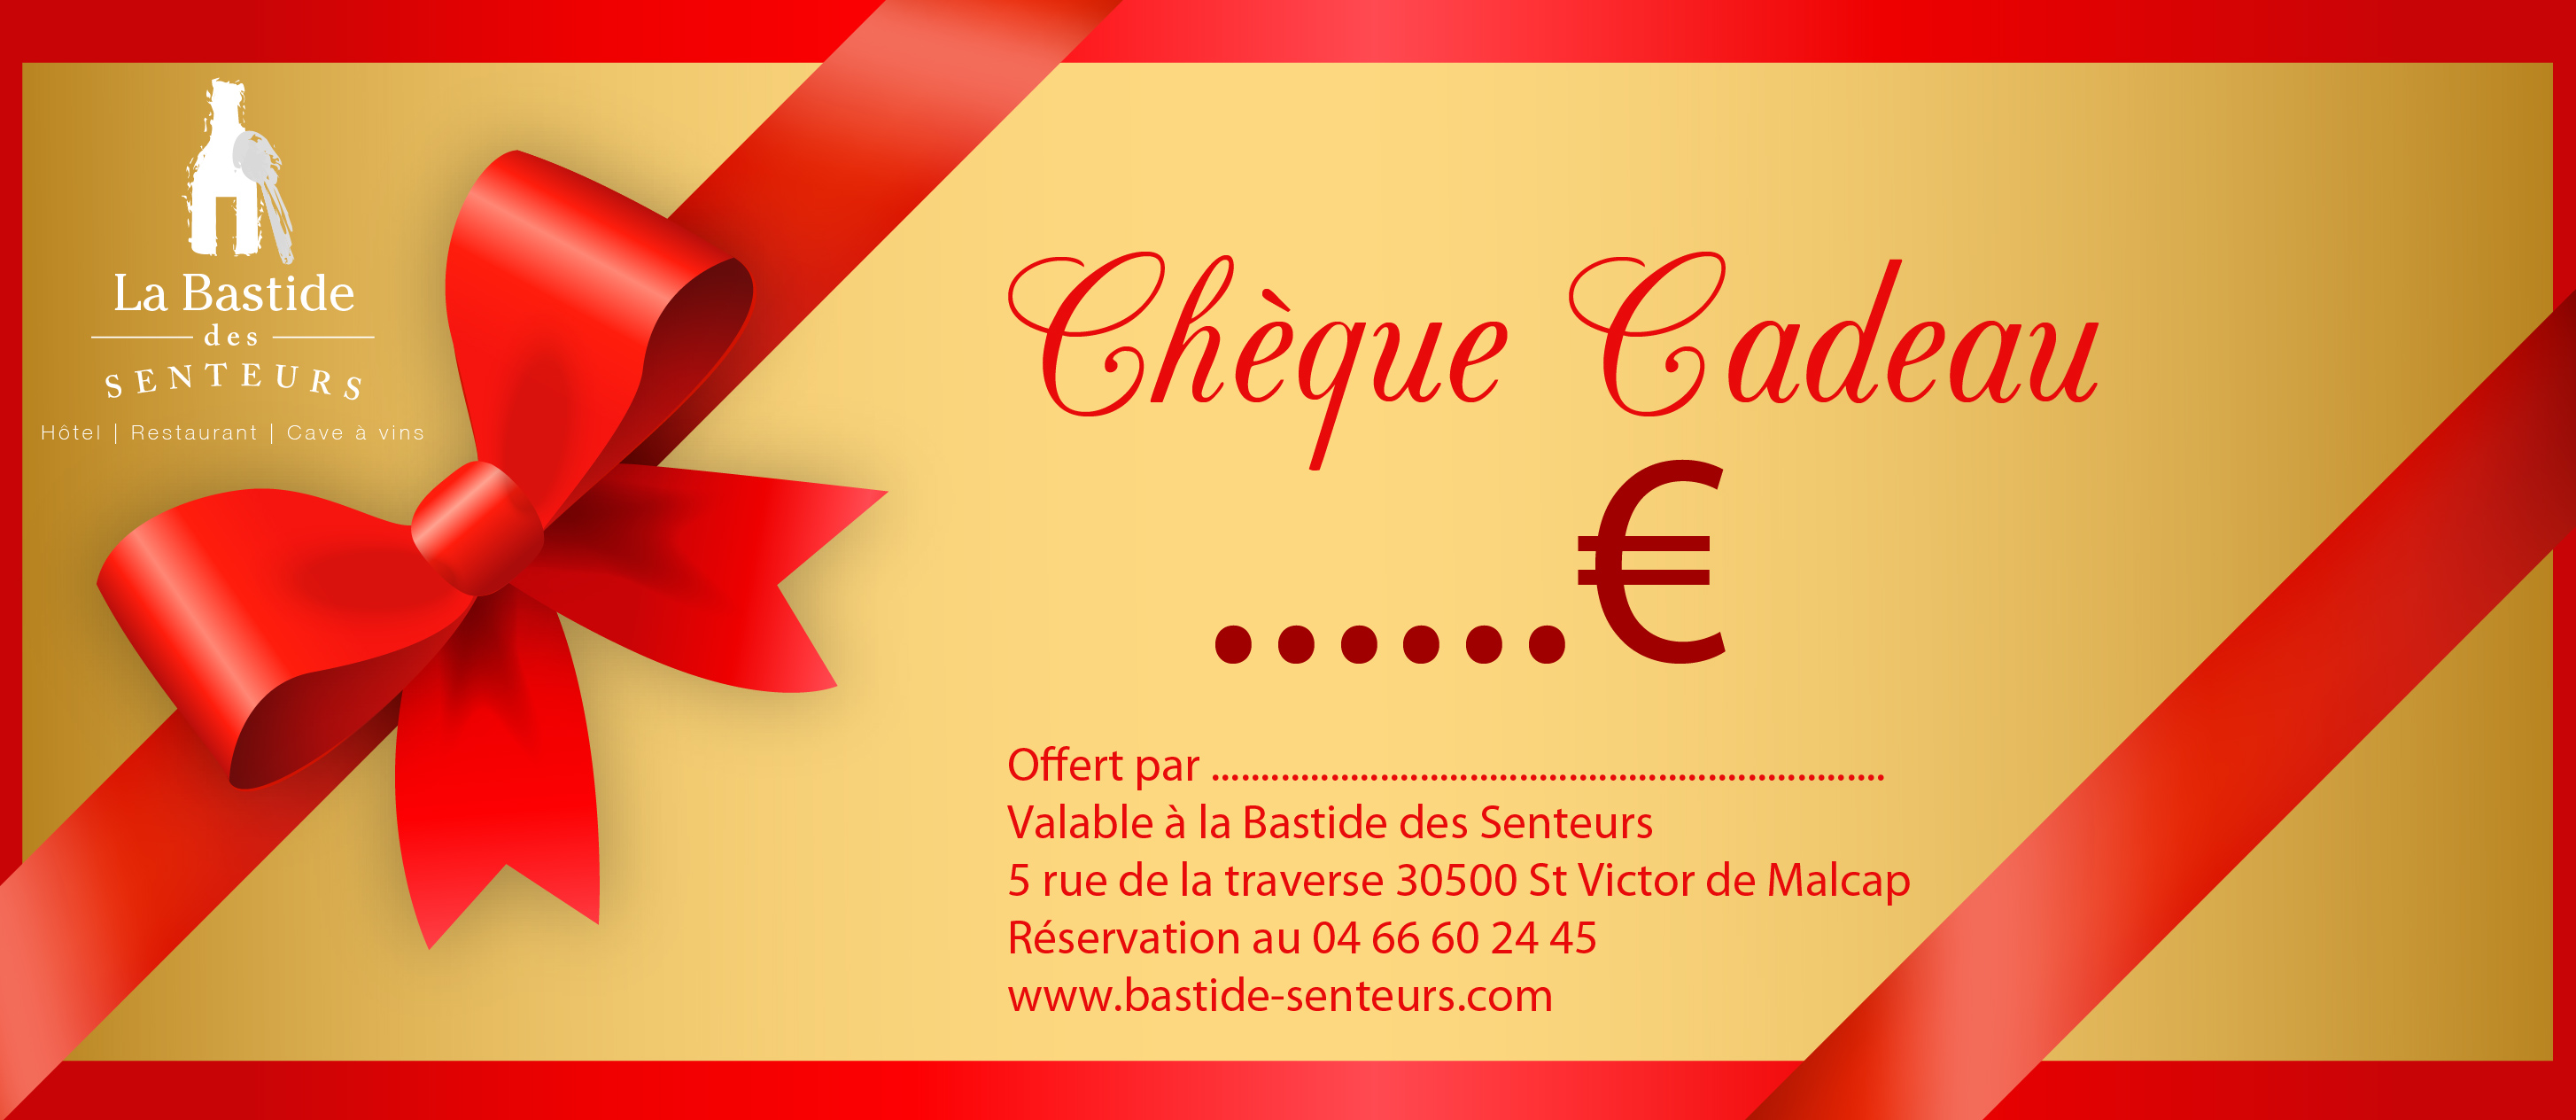 Carte Cadeau Restaurant.Carte Cadeau La Bastide Des Senteurs